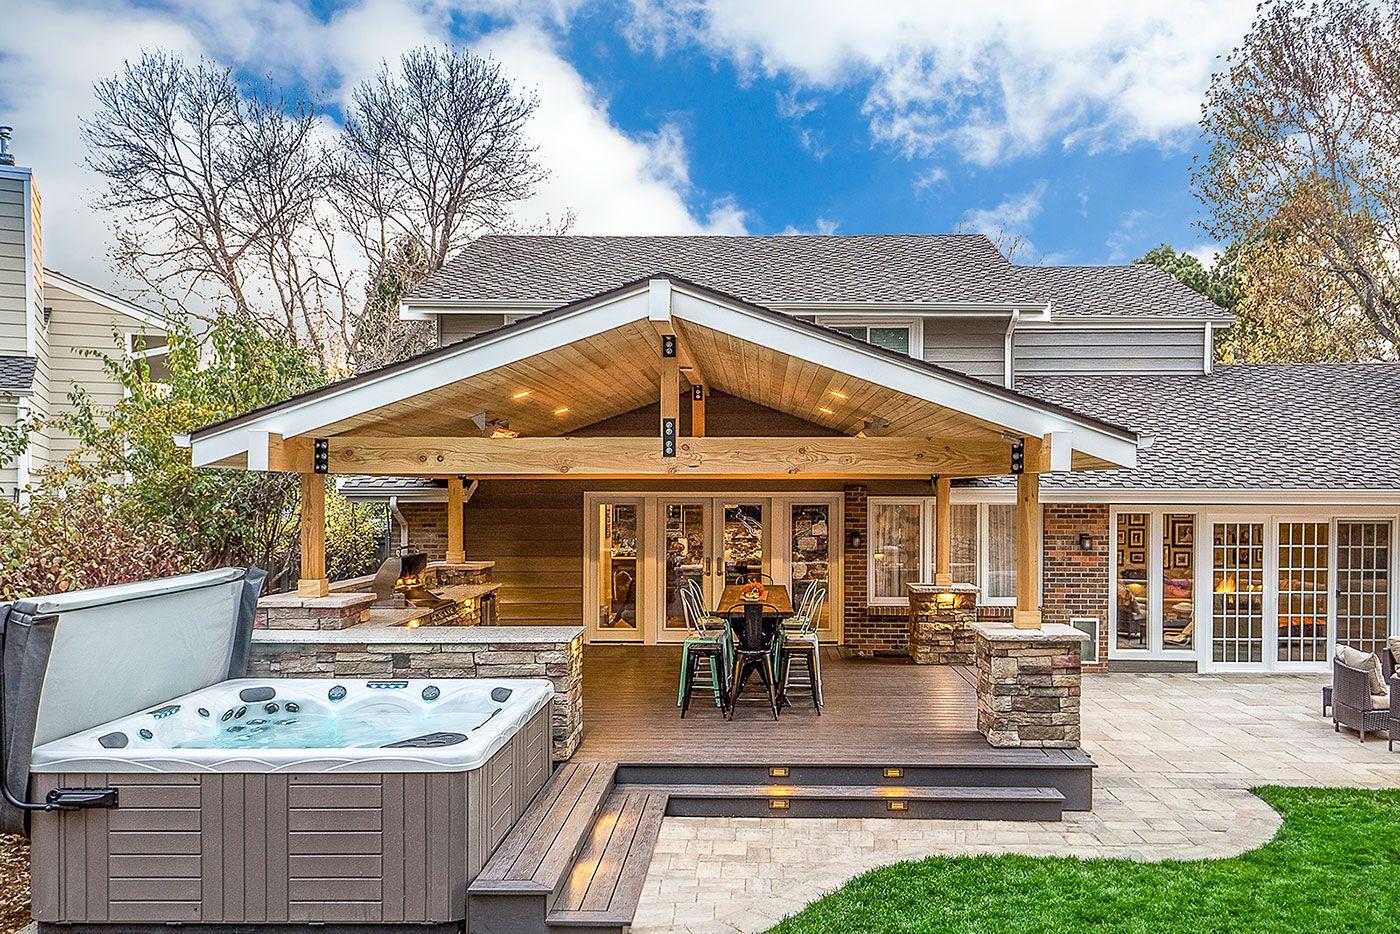 Outdoor Living Portfolio - Elite Landscape & Outdoor ... on Outdoor Living And Landscapes id=25494